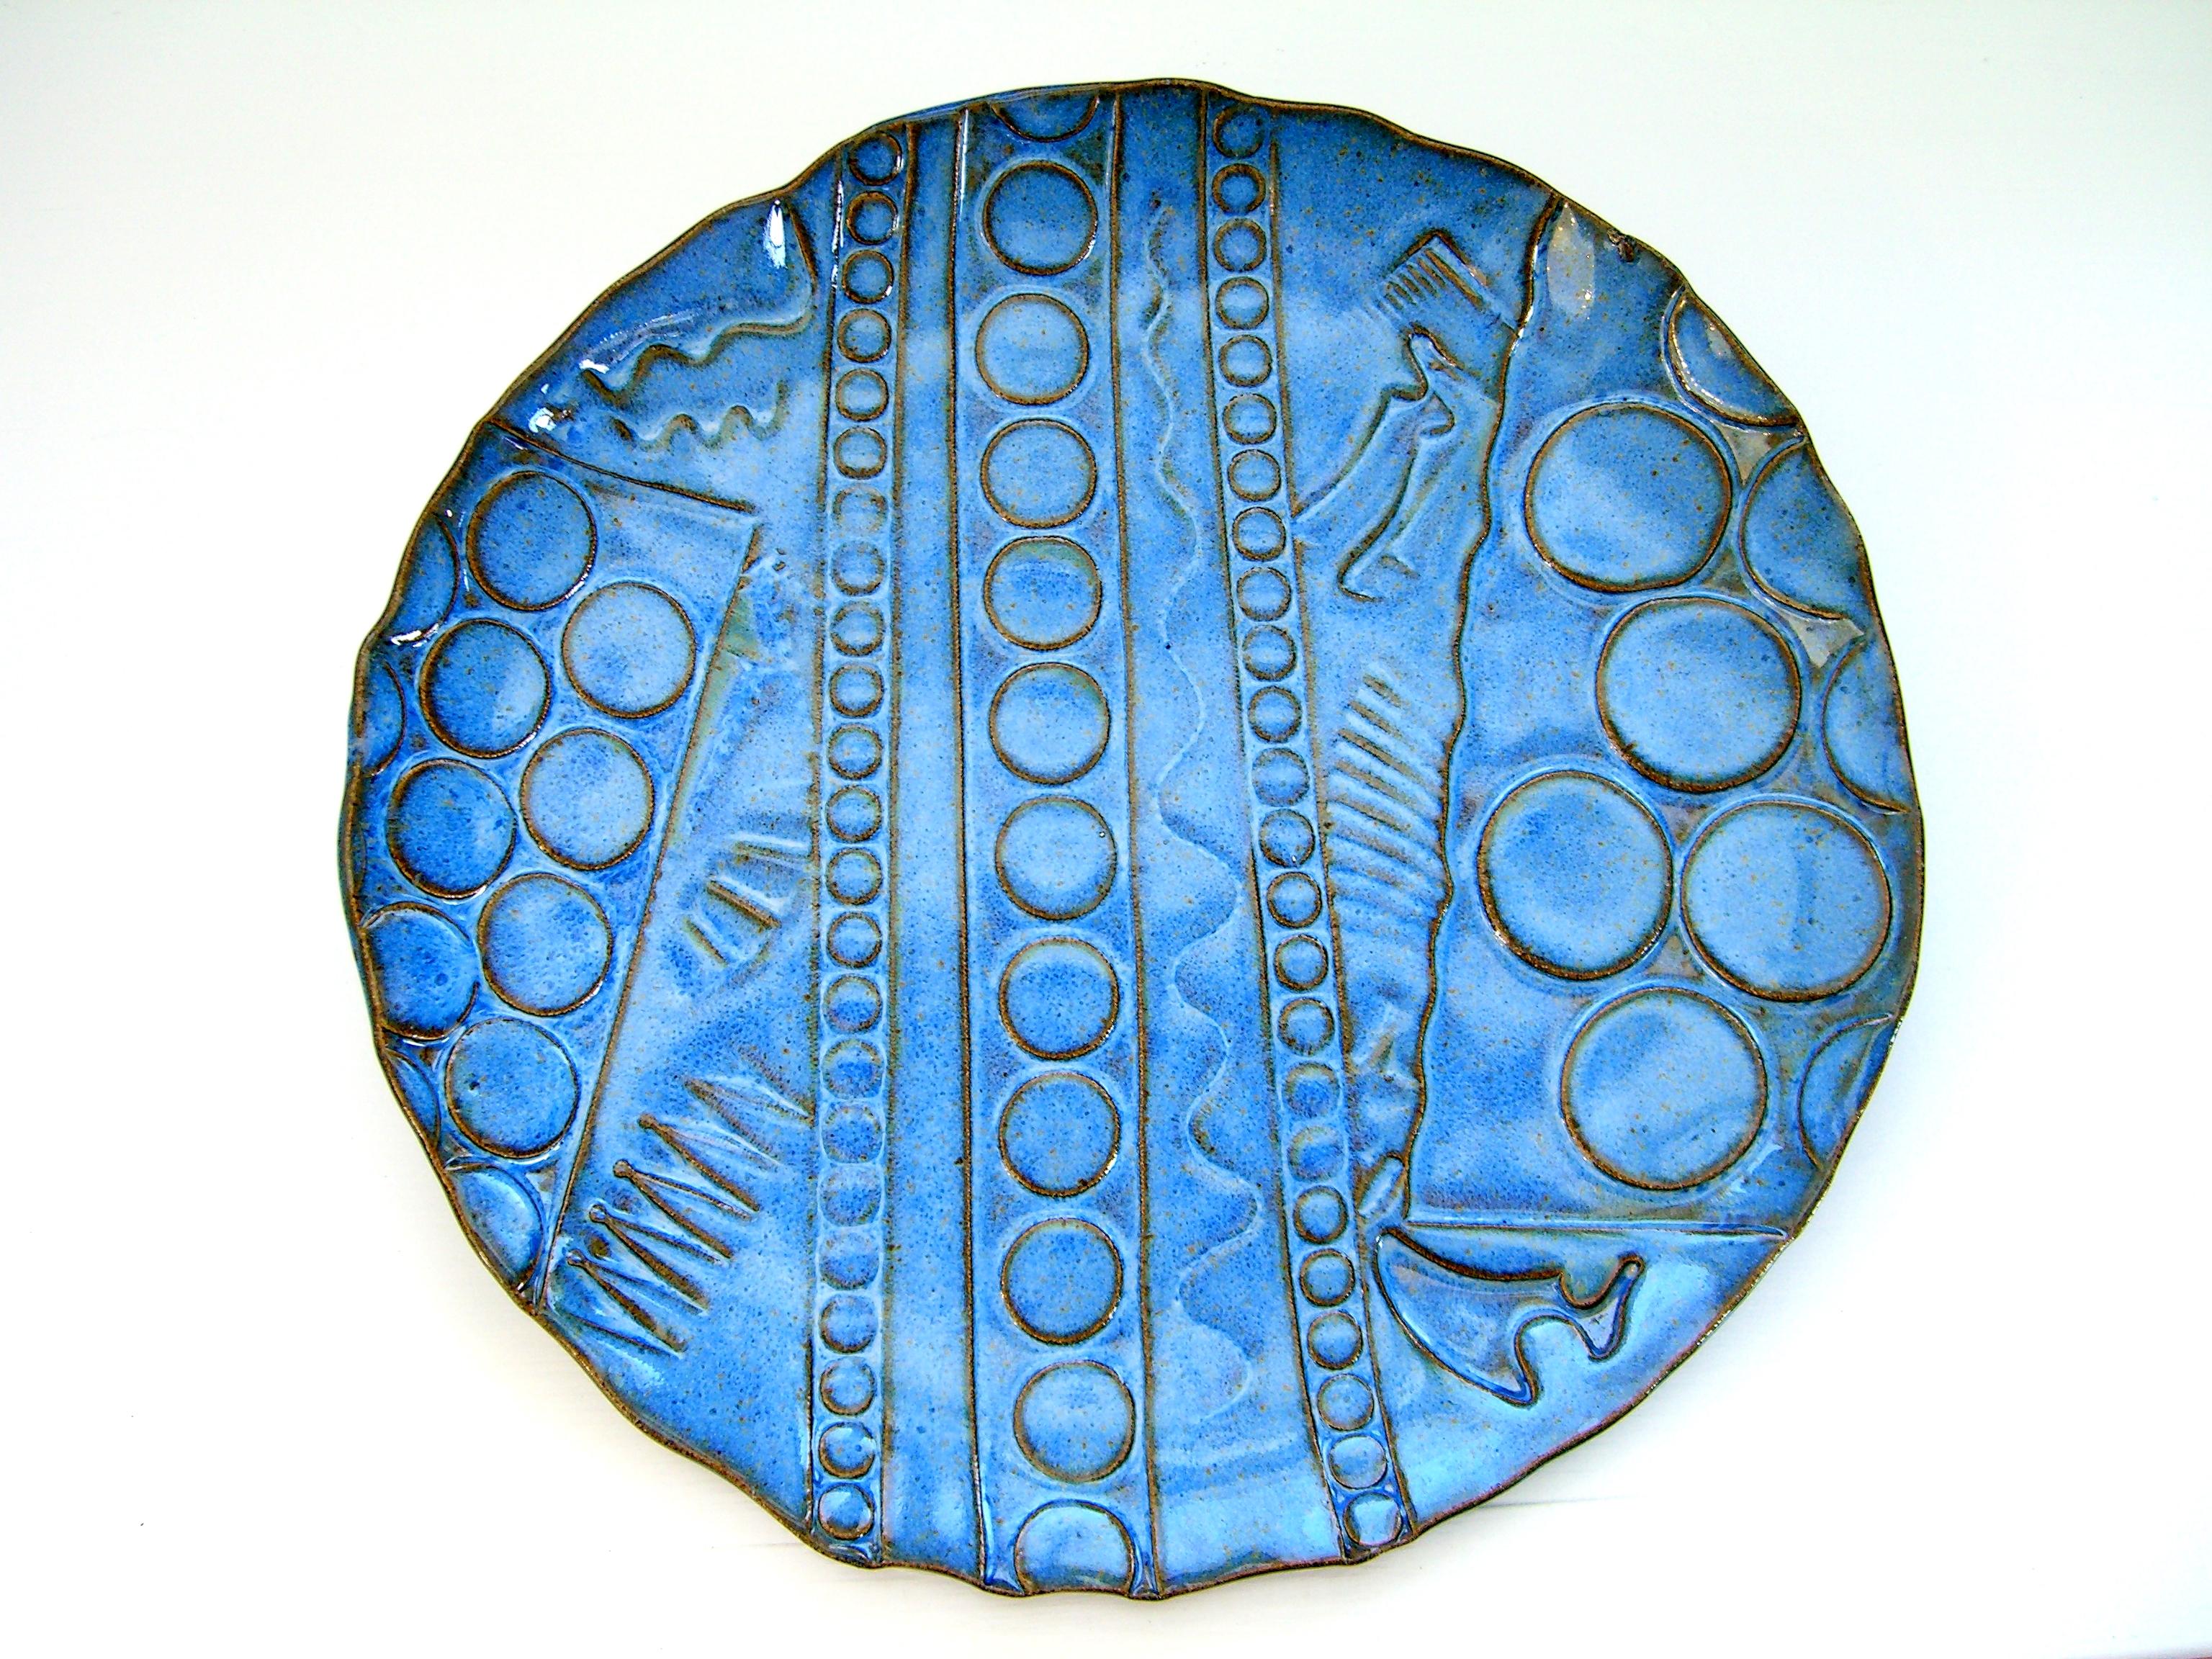 Cloudy blue dinner plate